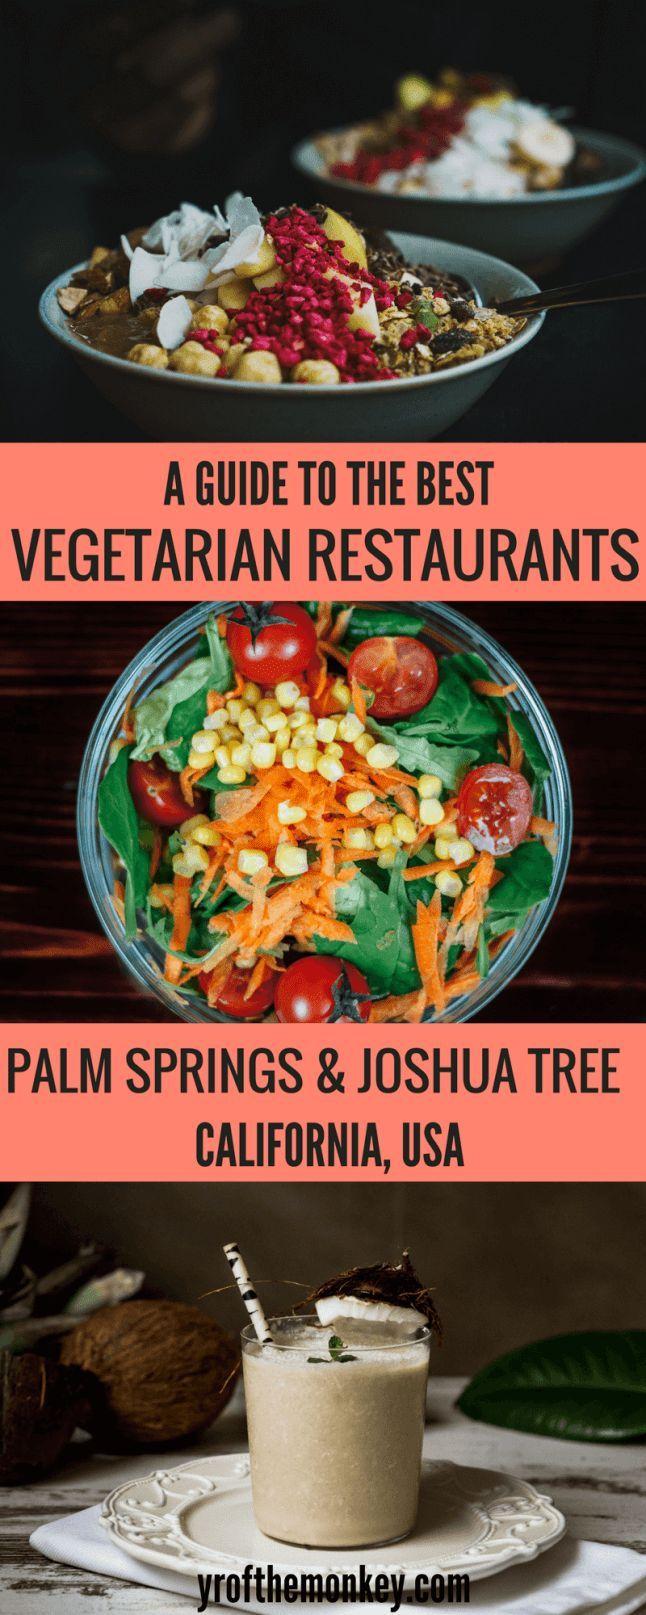 Vegetarian Restaurants Palm Springs And Joshua Tree Restaurants Foodie Travel Travel Food